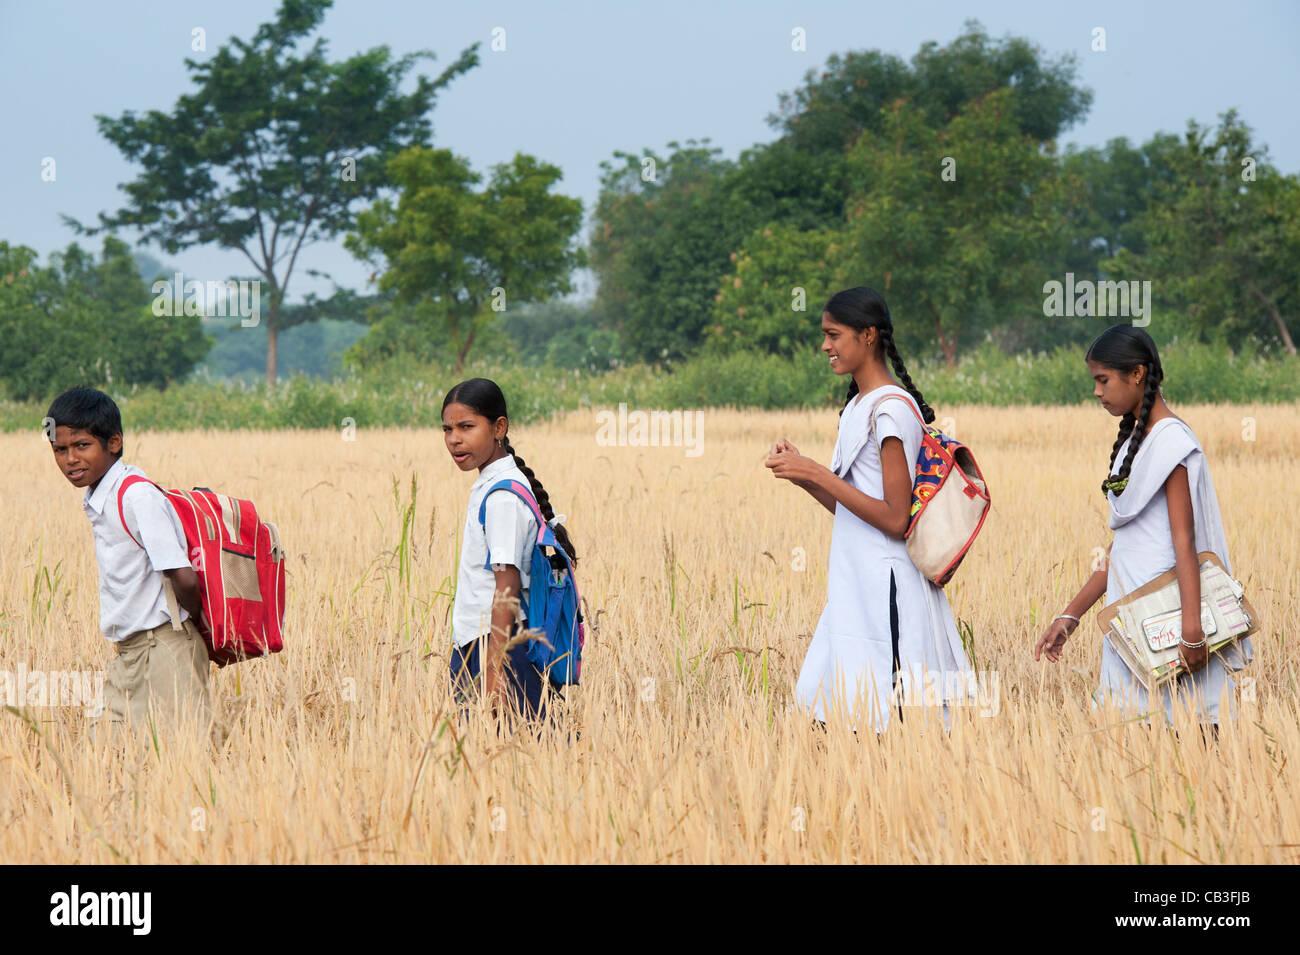 Indian children walking to school through ripe rice paddy field. Andhra Pradesh, India - Stock Image